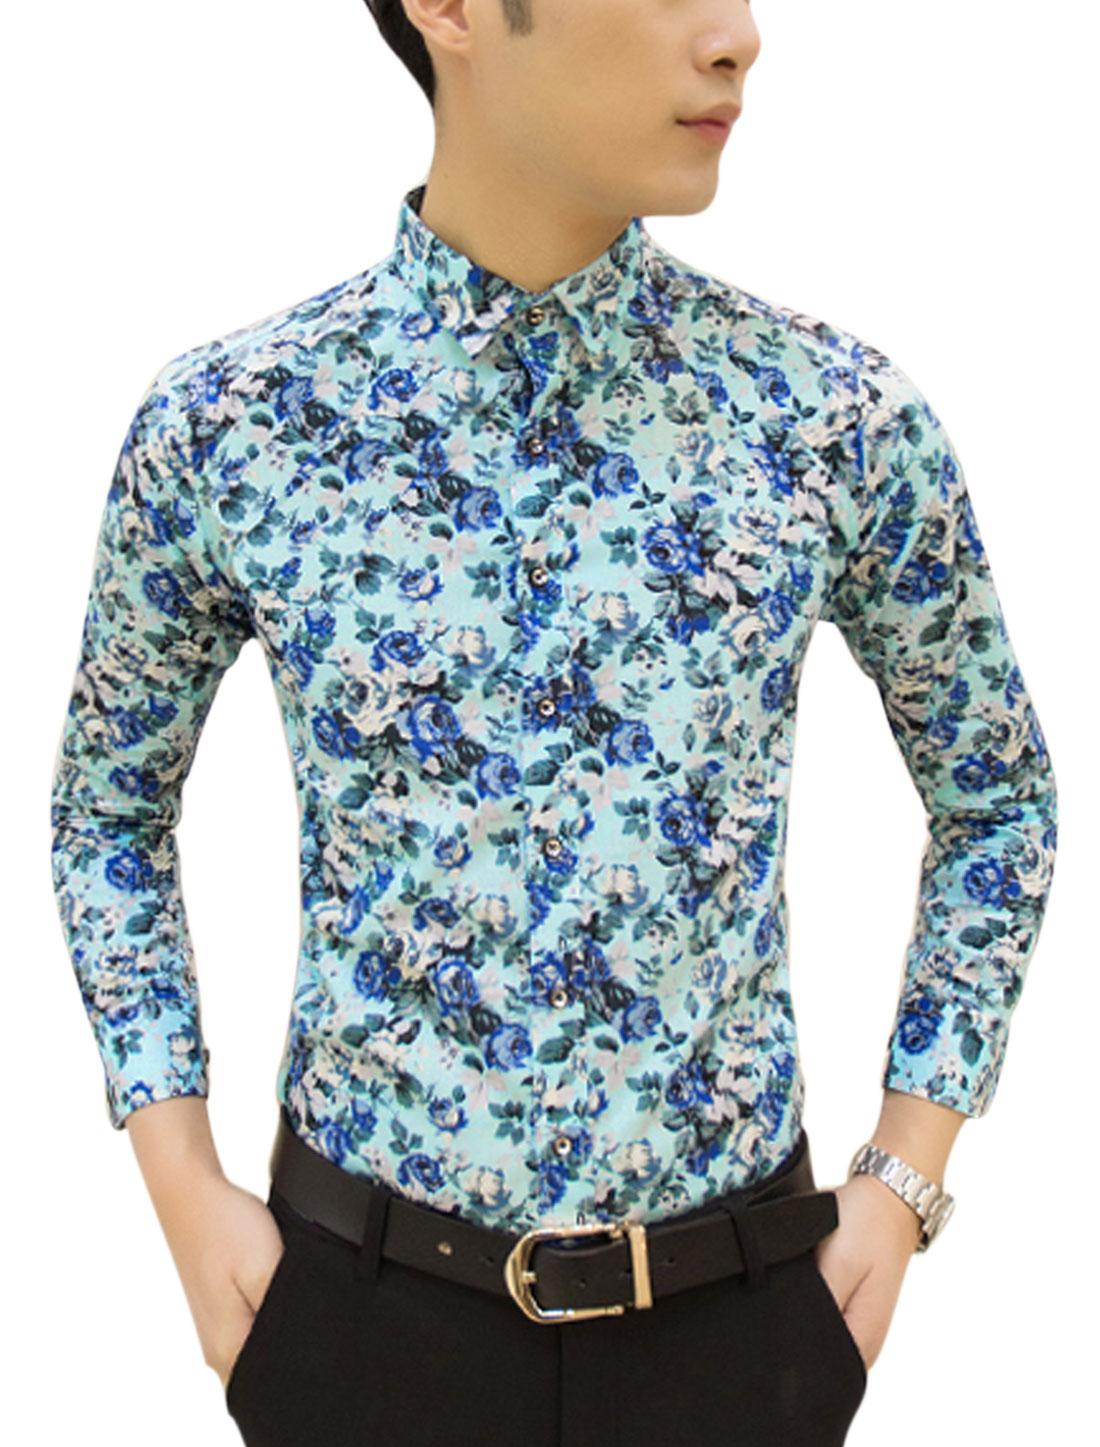 Man Floral Prints Long Sleeves Slim Fit Casual Shirt Light Blue M